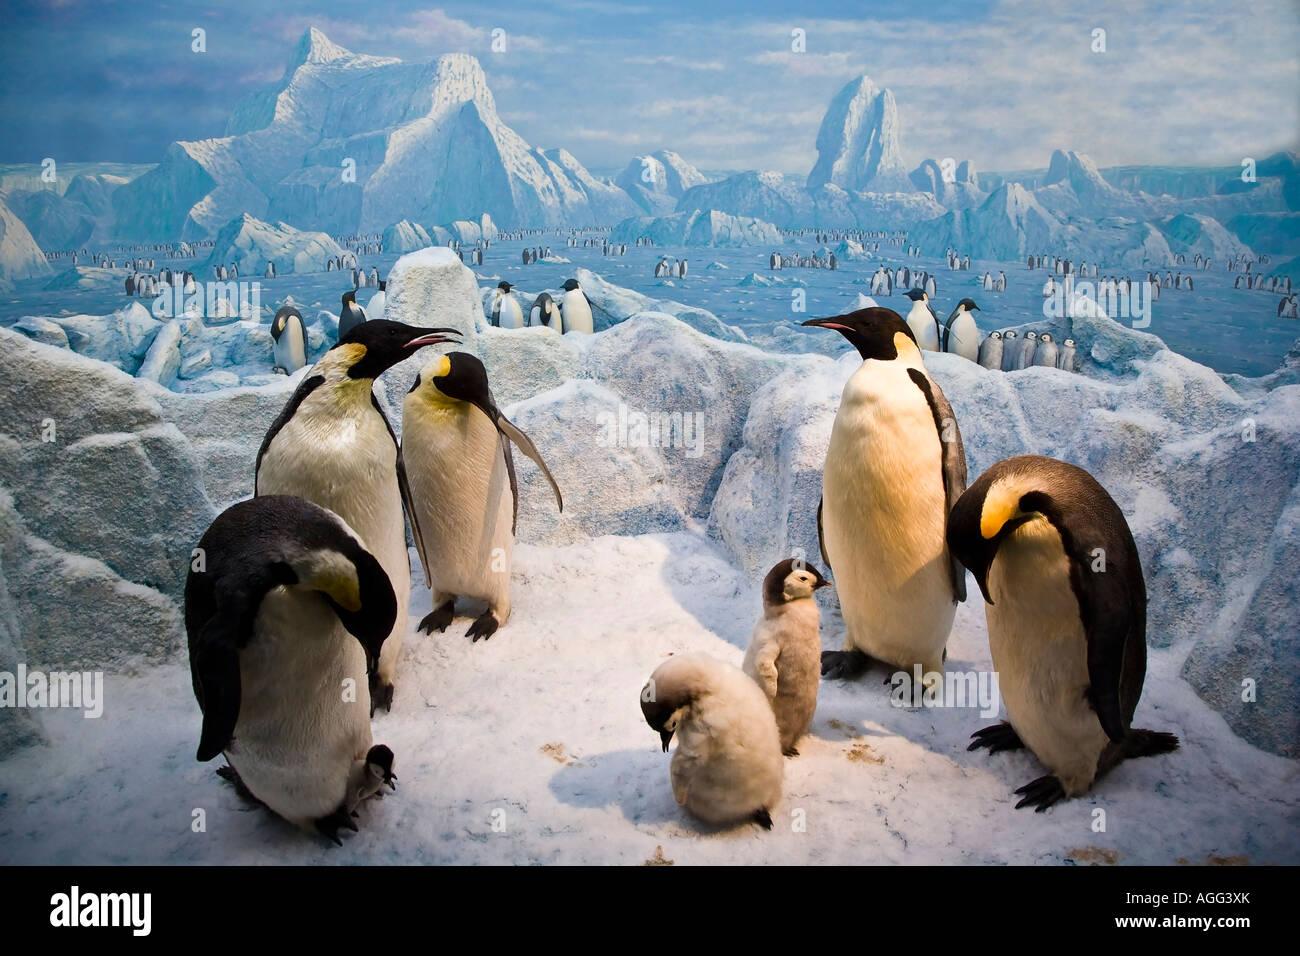 Emperor Penguins - Stock Image